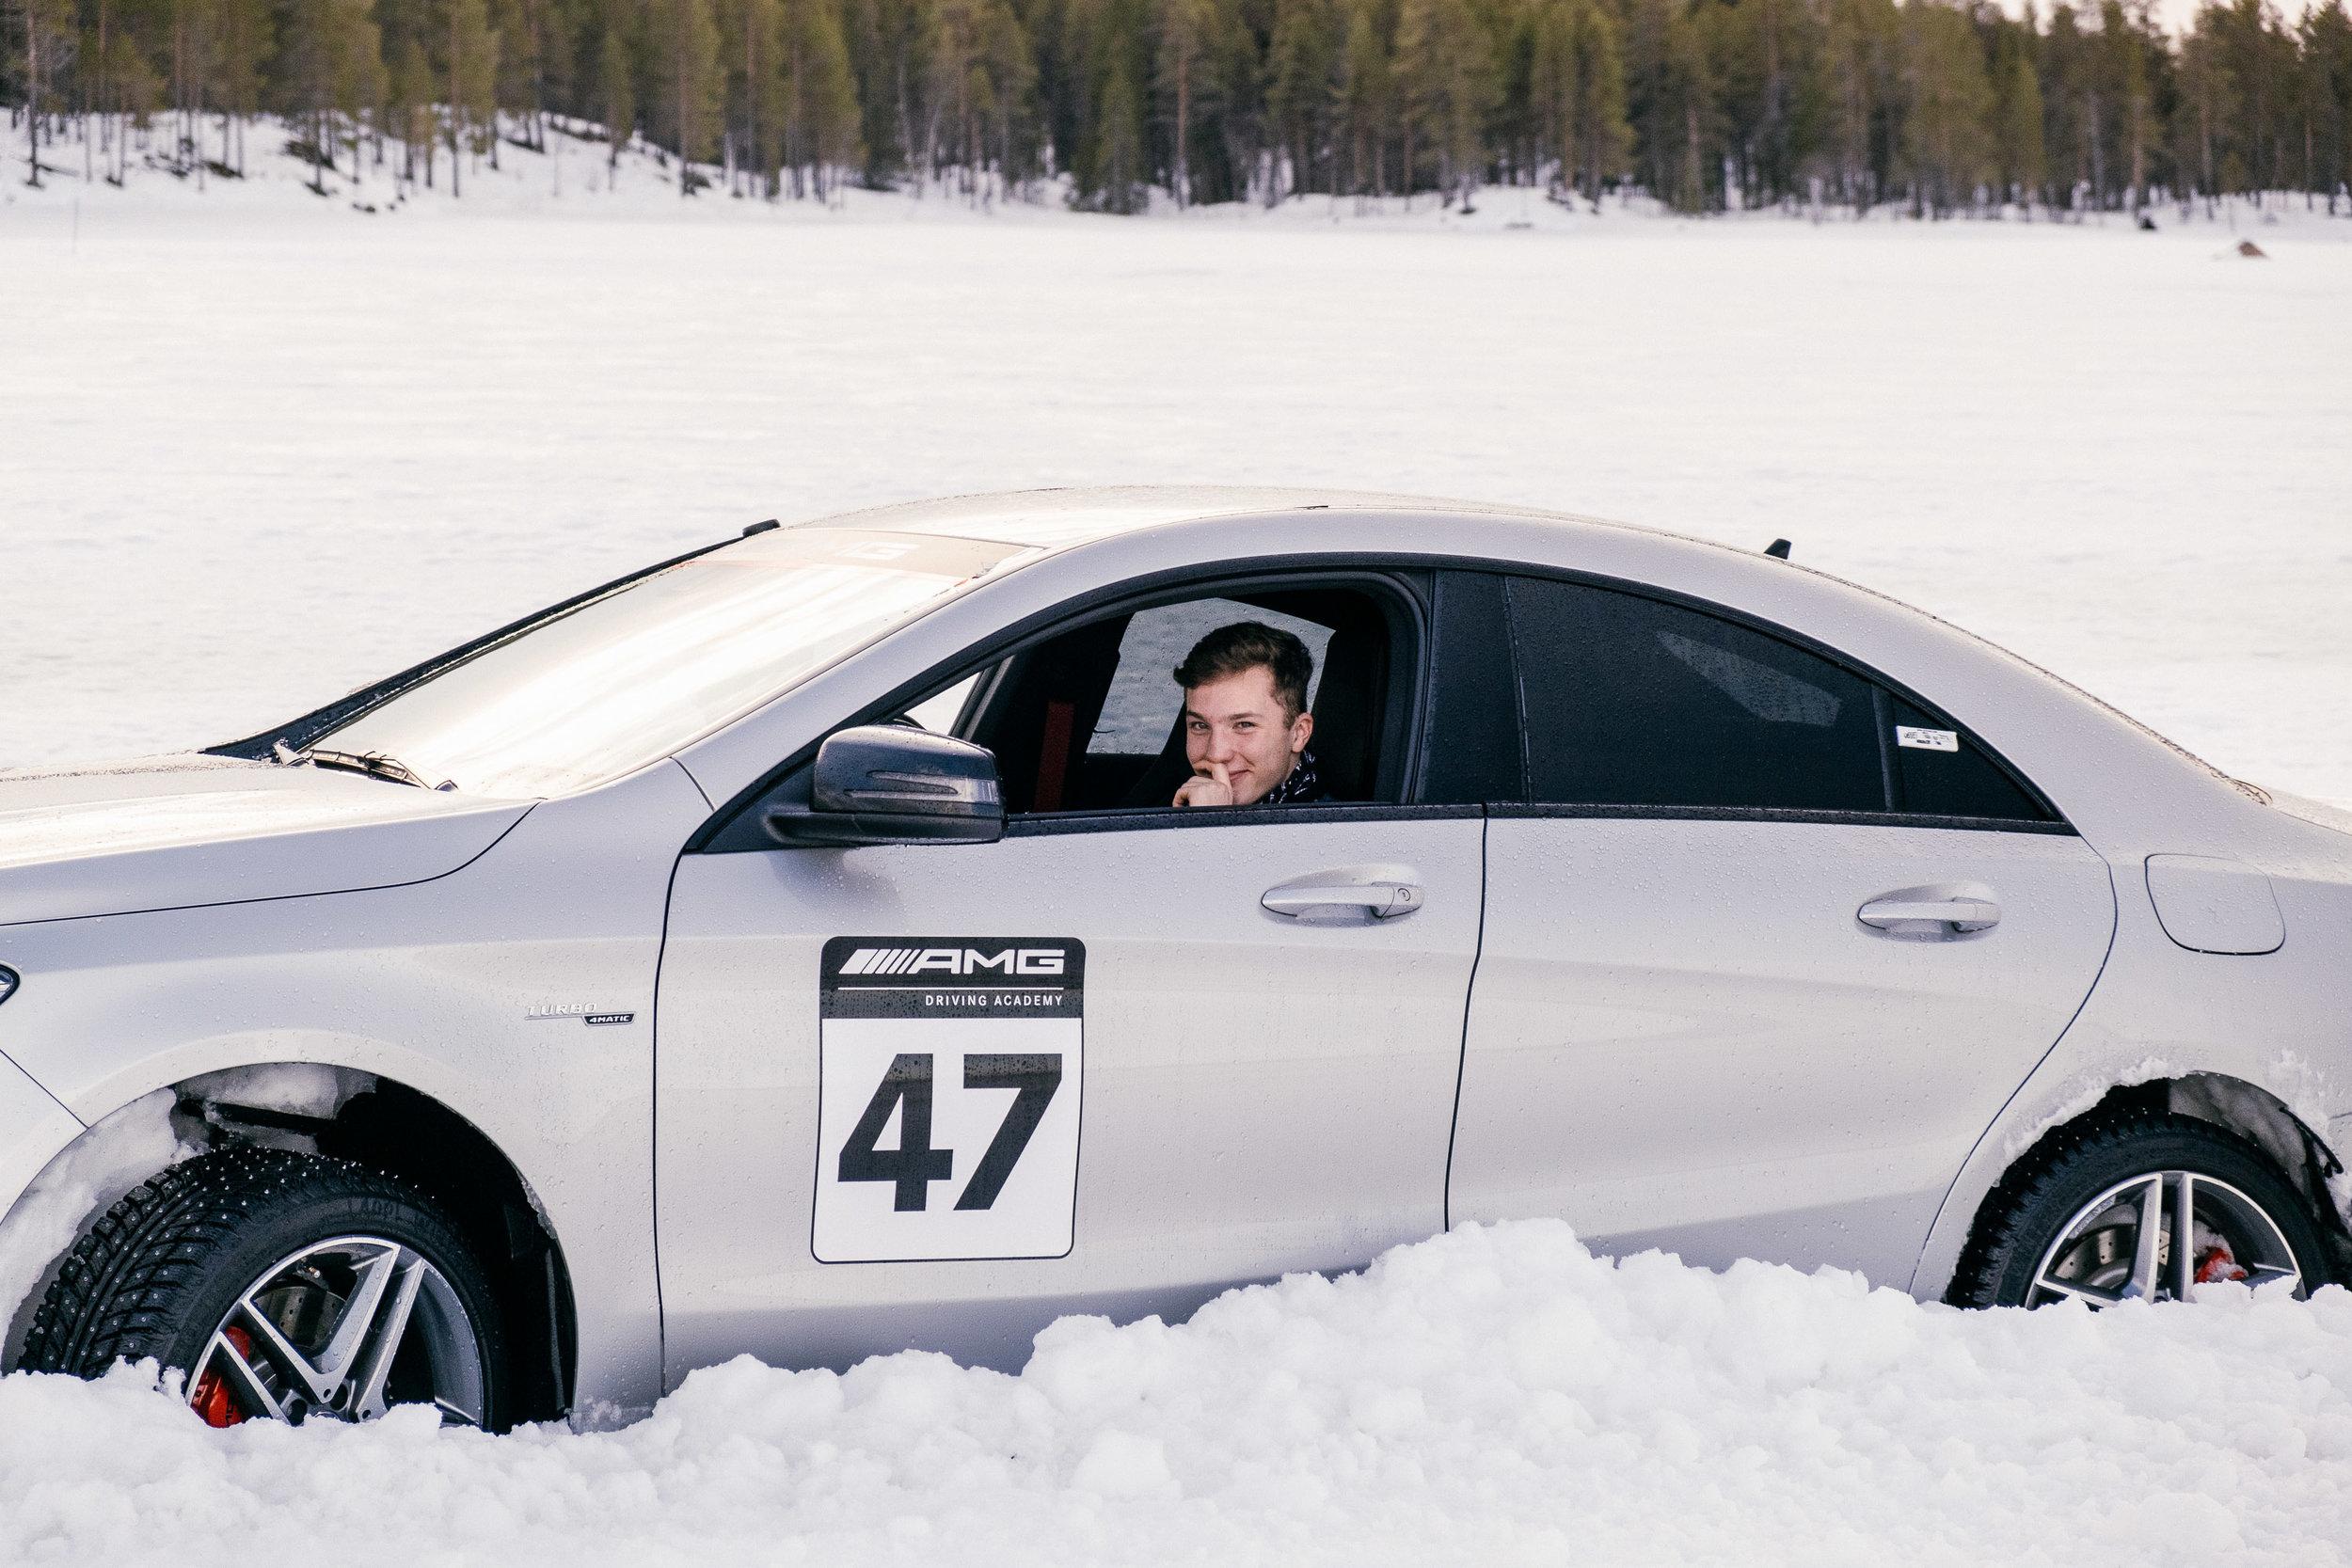 Drive_for_Good_Ice_Drive_by_Maxim_Kuijper-0469.jpg